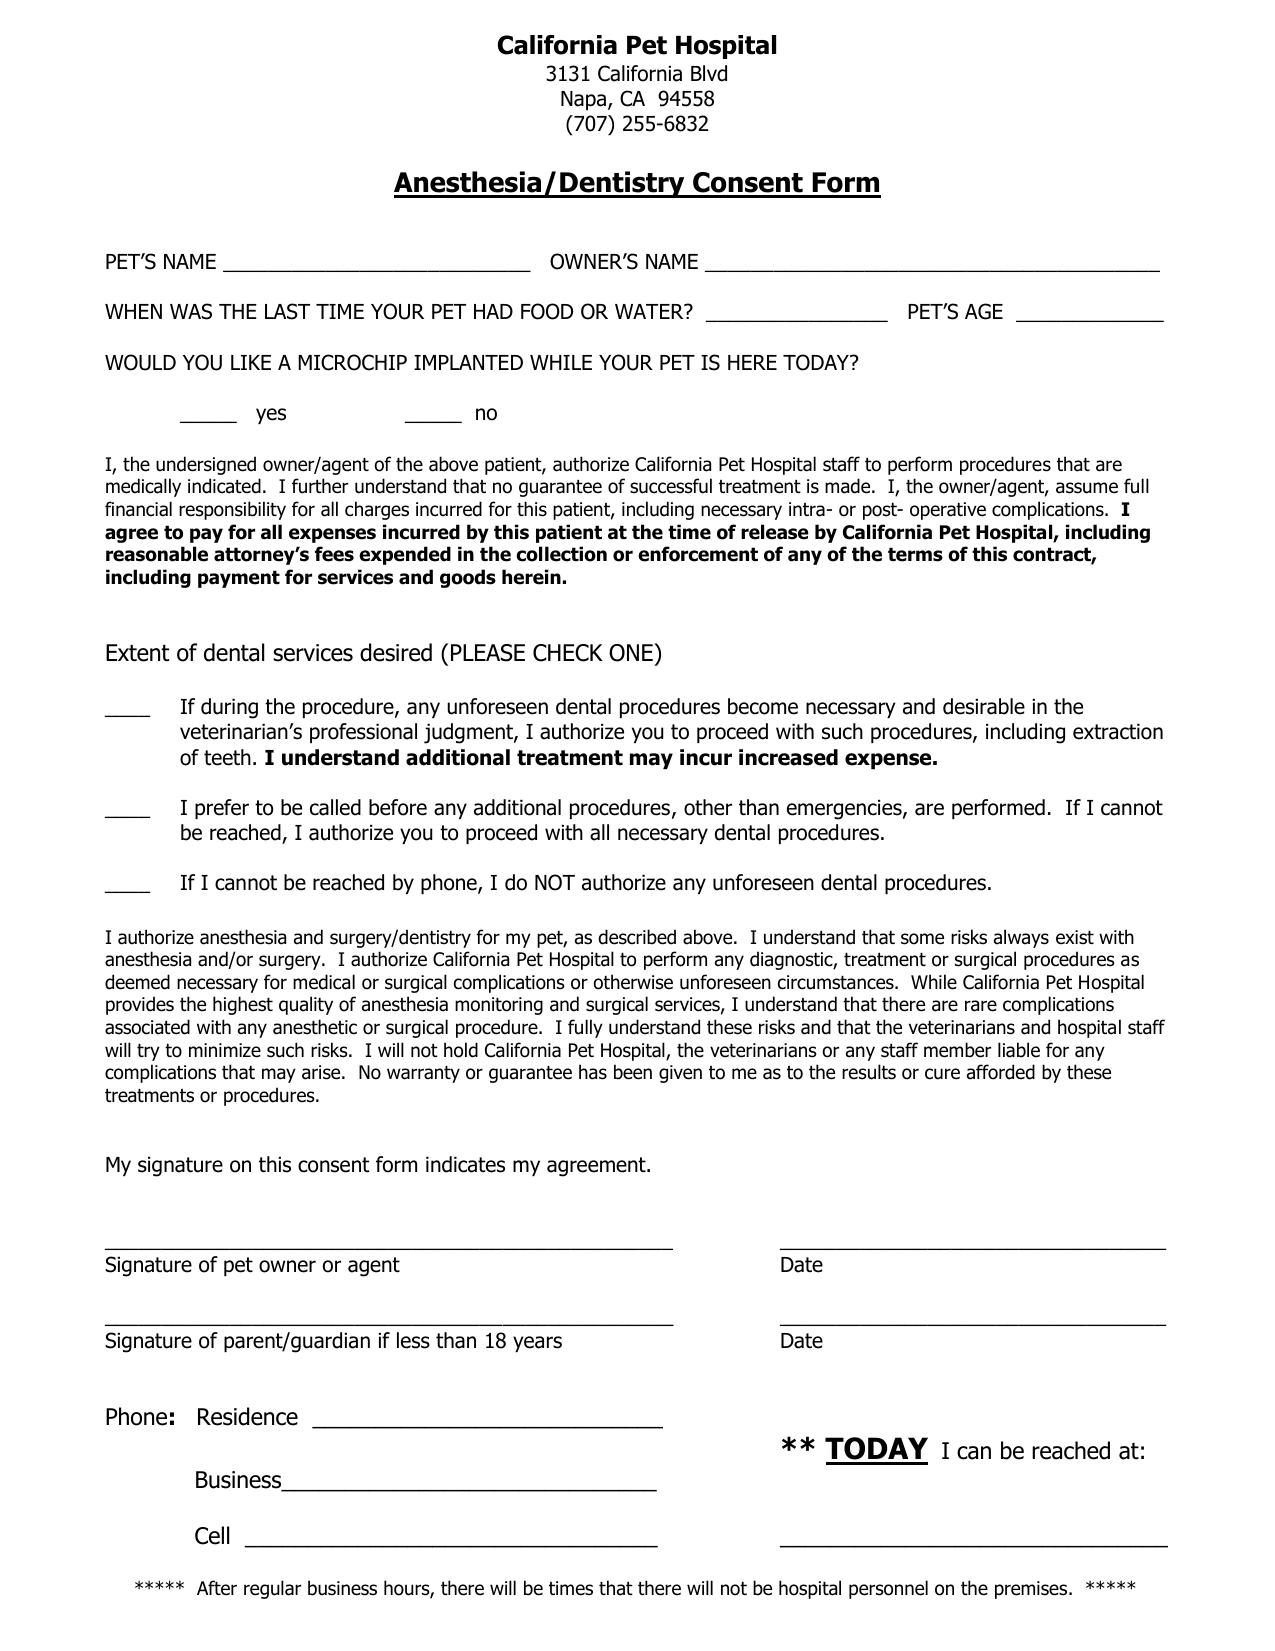 Admission and anesthesia consent altavistaventures Choice Image